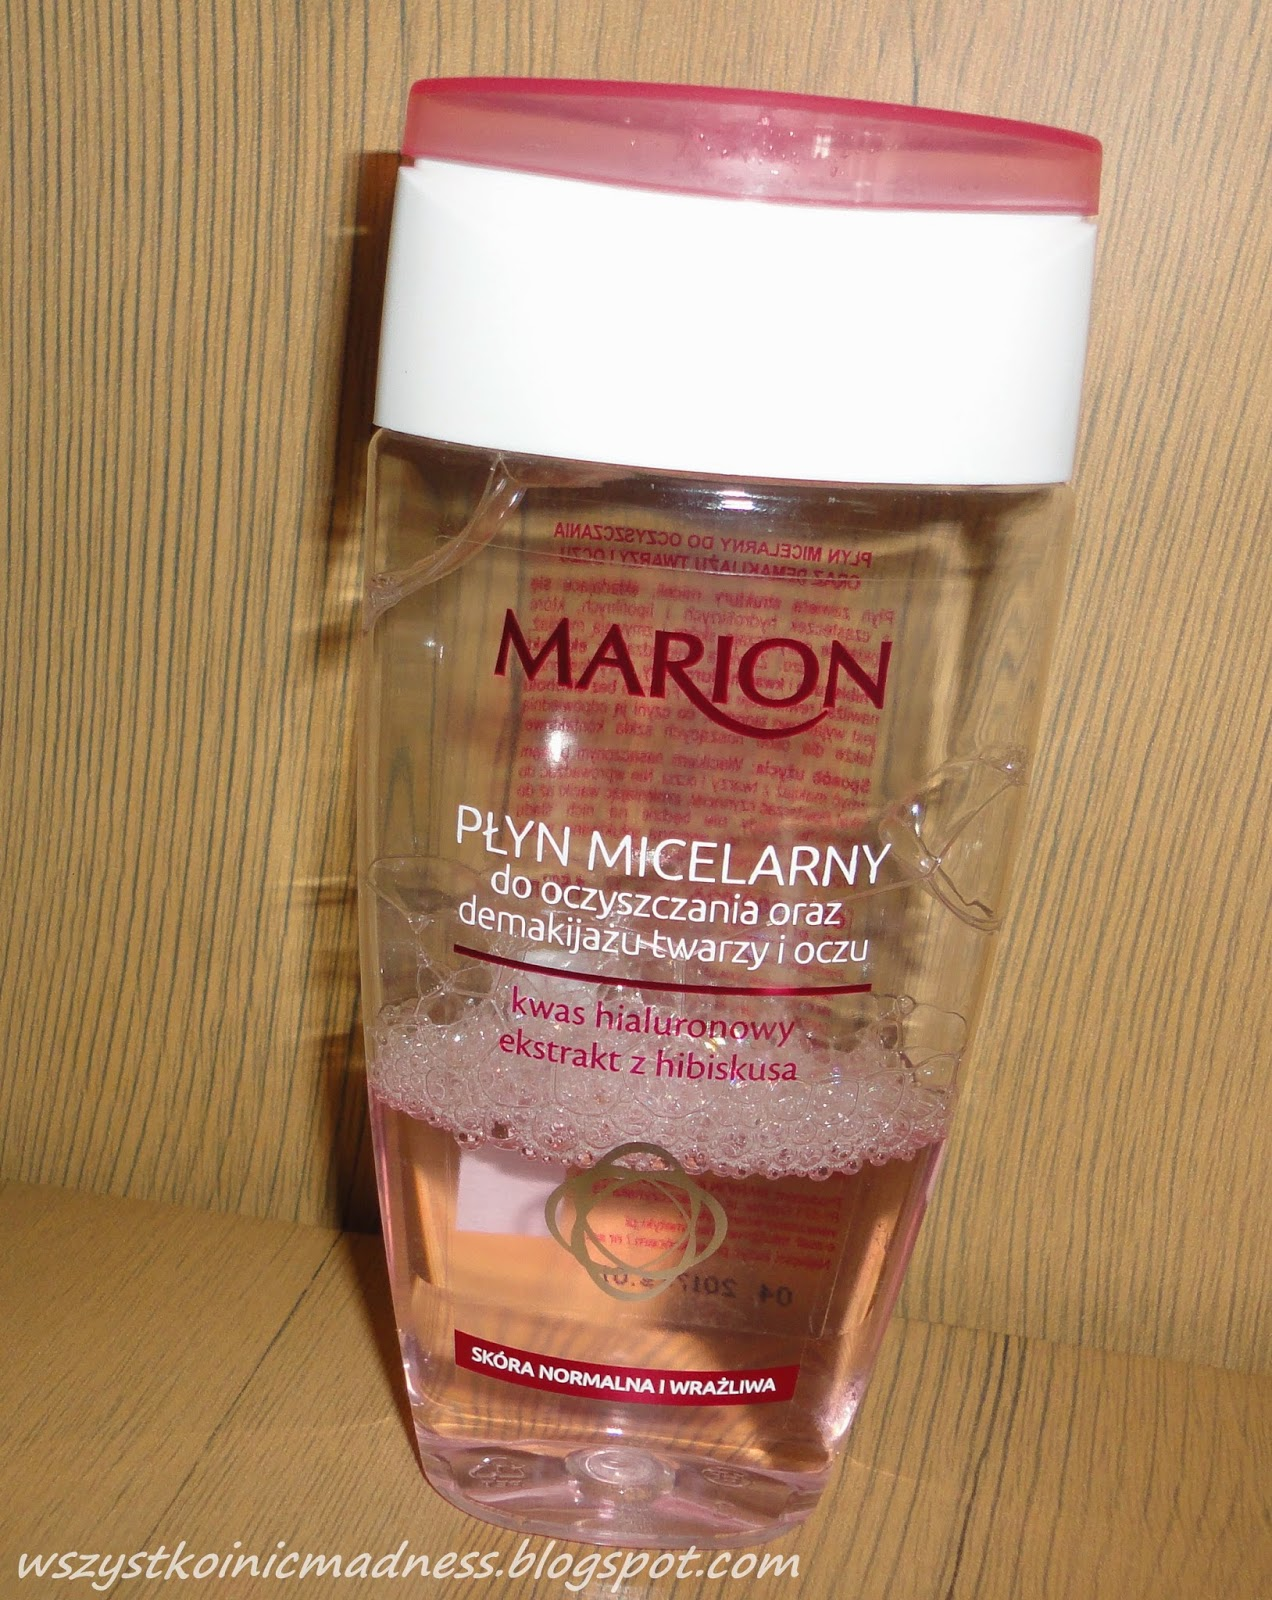 Marion płyn micelarny kwas hialuronowy i ekstrakt z hibiskusa